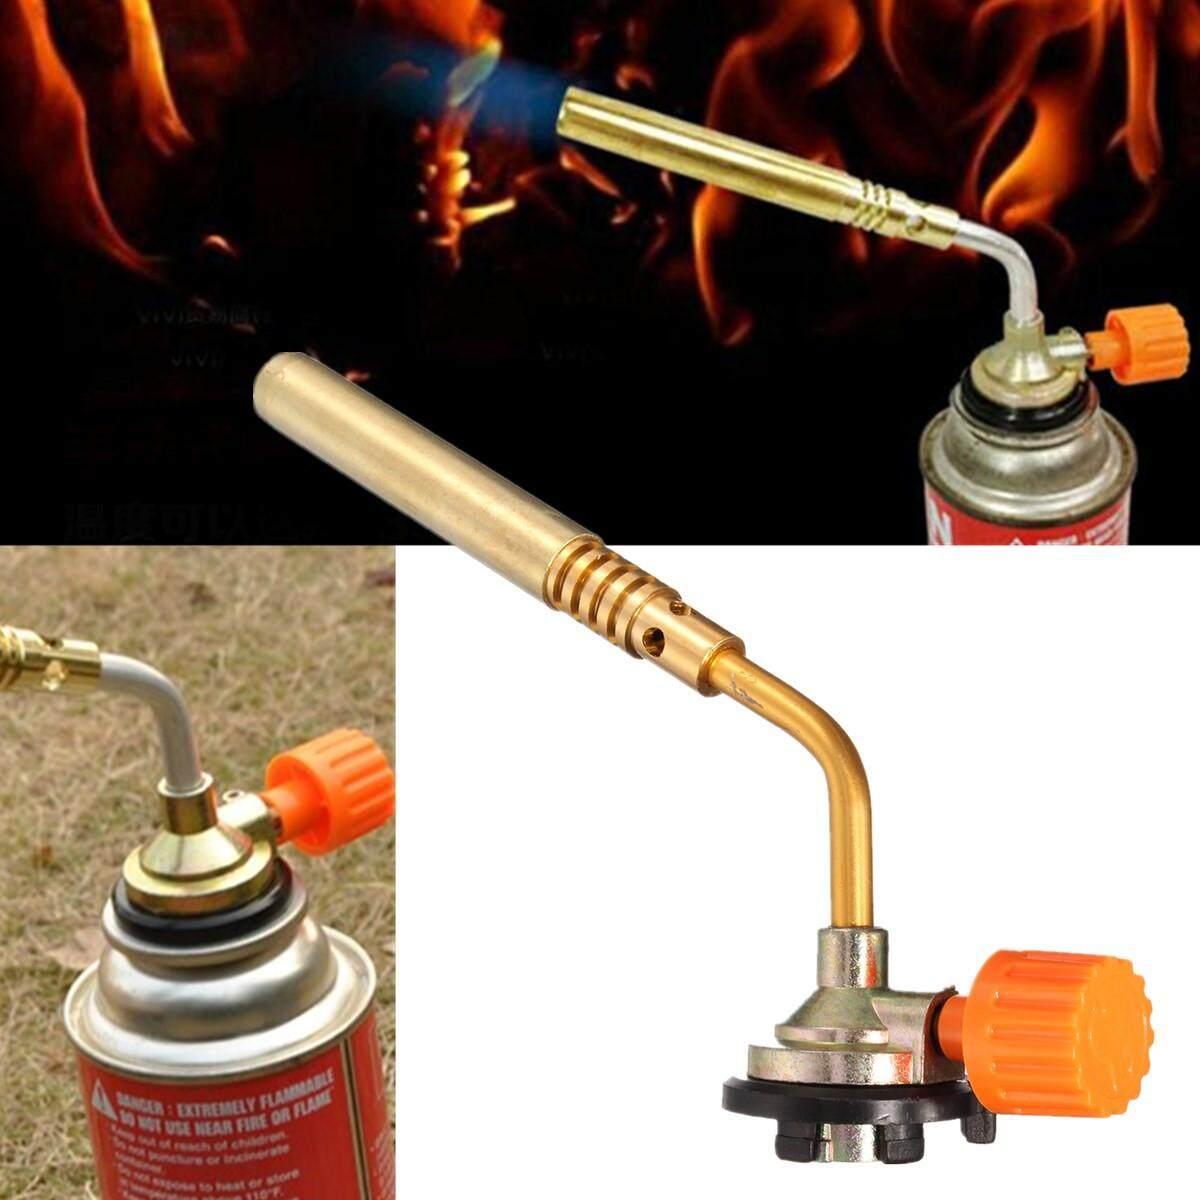 X503 Pencil Jet Torch Butane Gas Lighter 1800 Degree Flame. Source ·. Source .